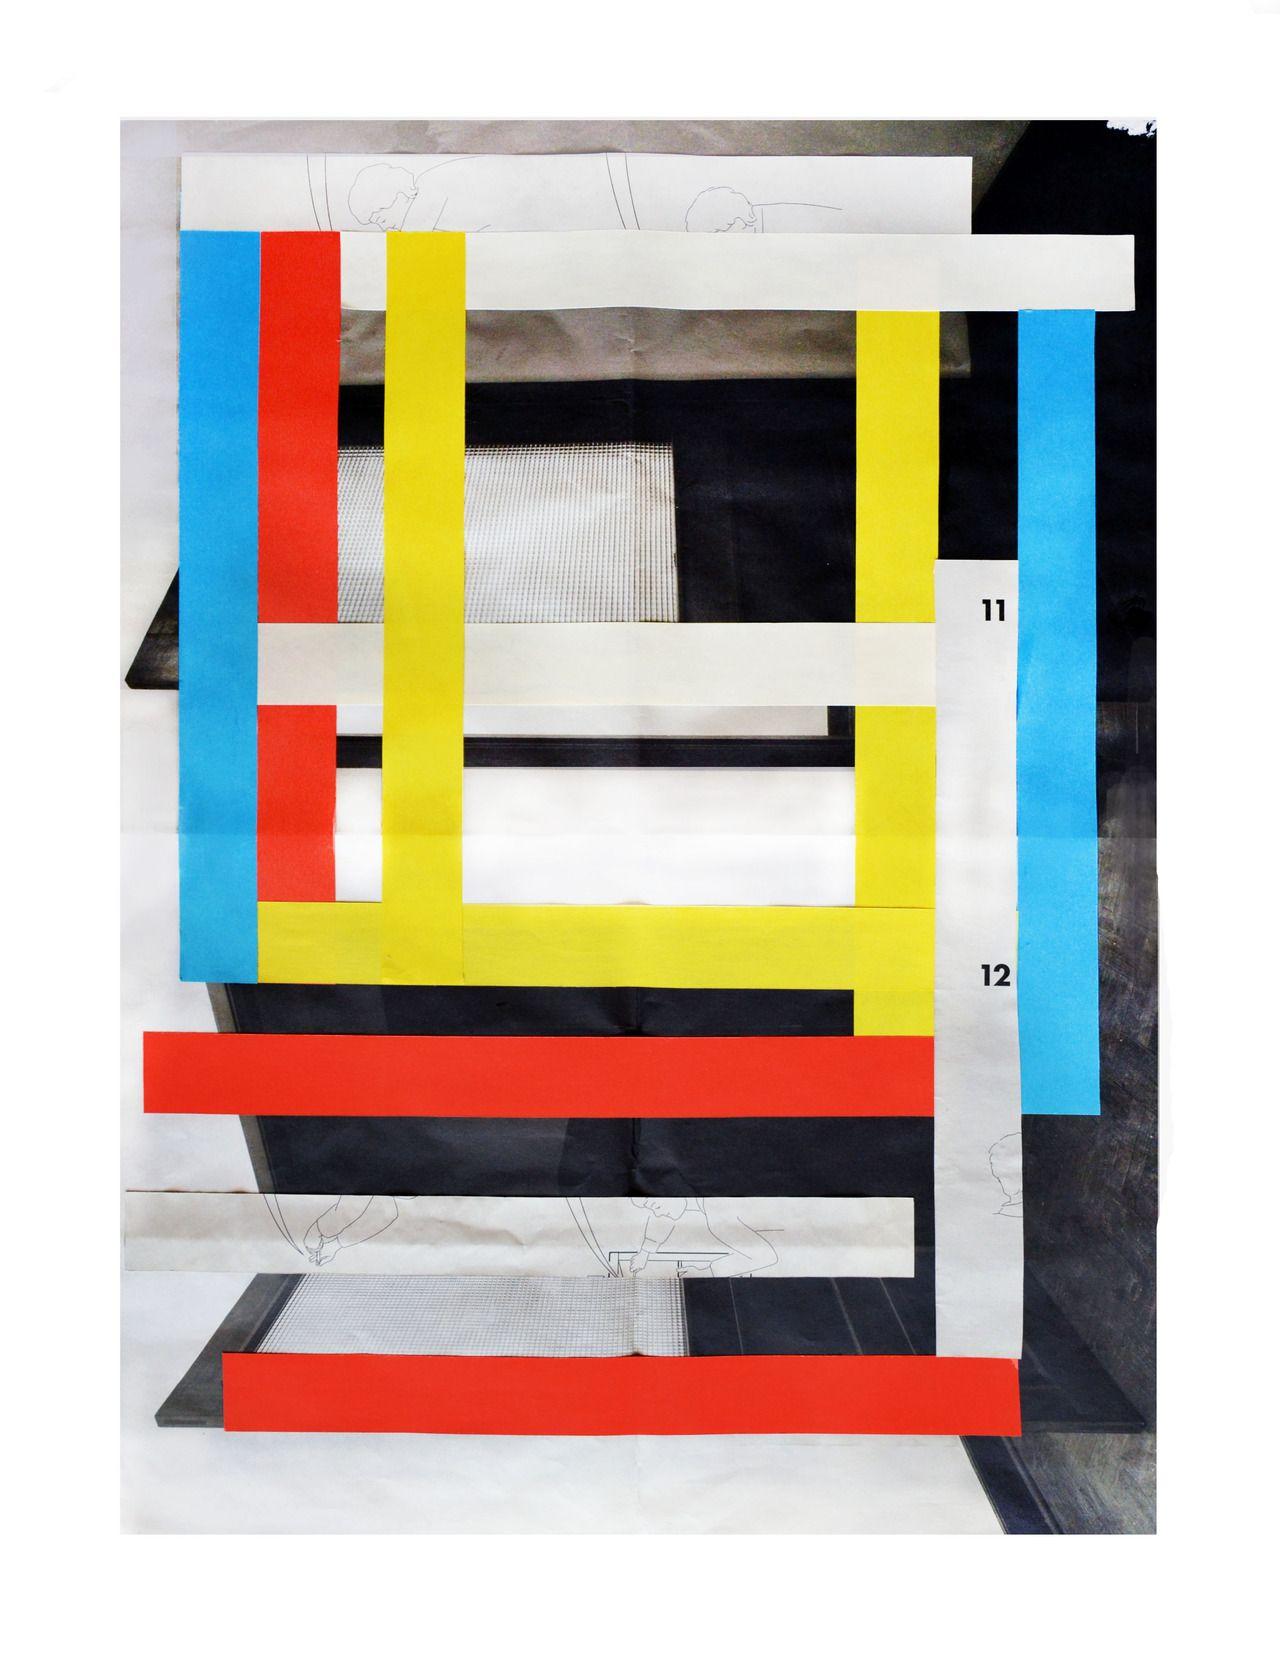 isabellucena:  Isabel Lucena. Untitled, 2012